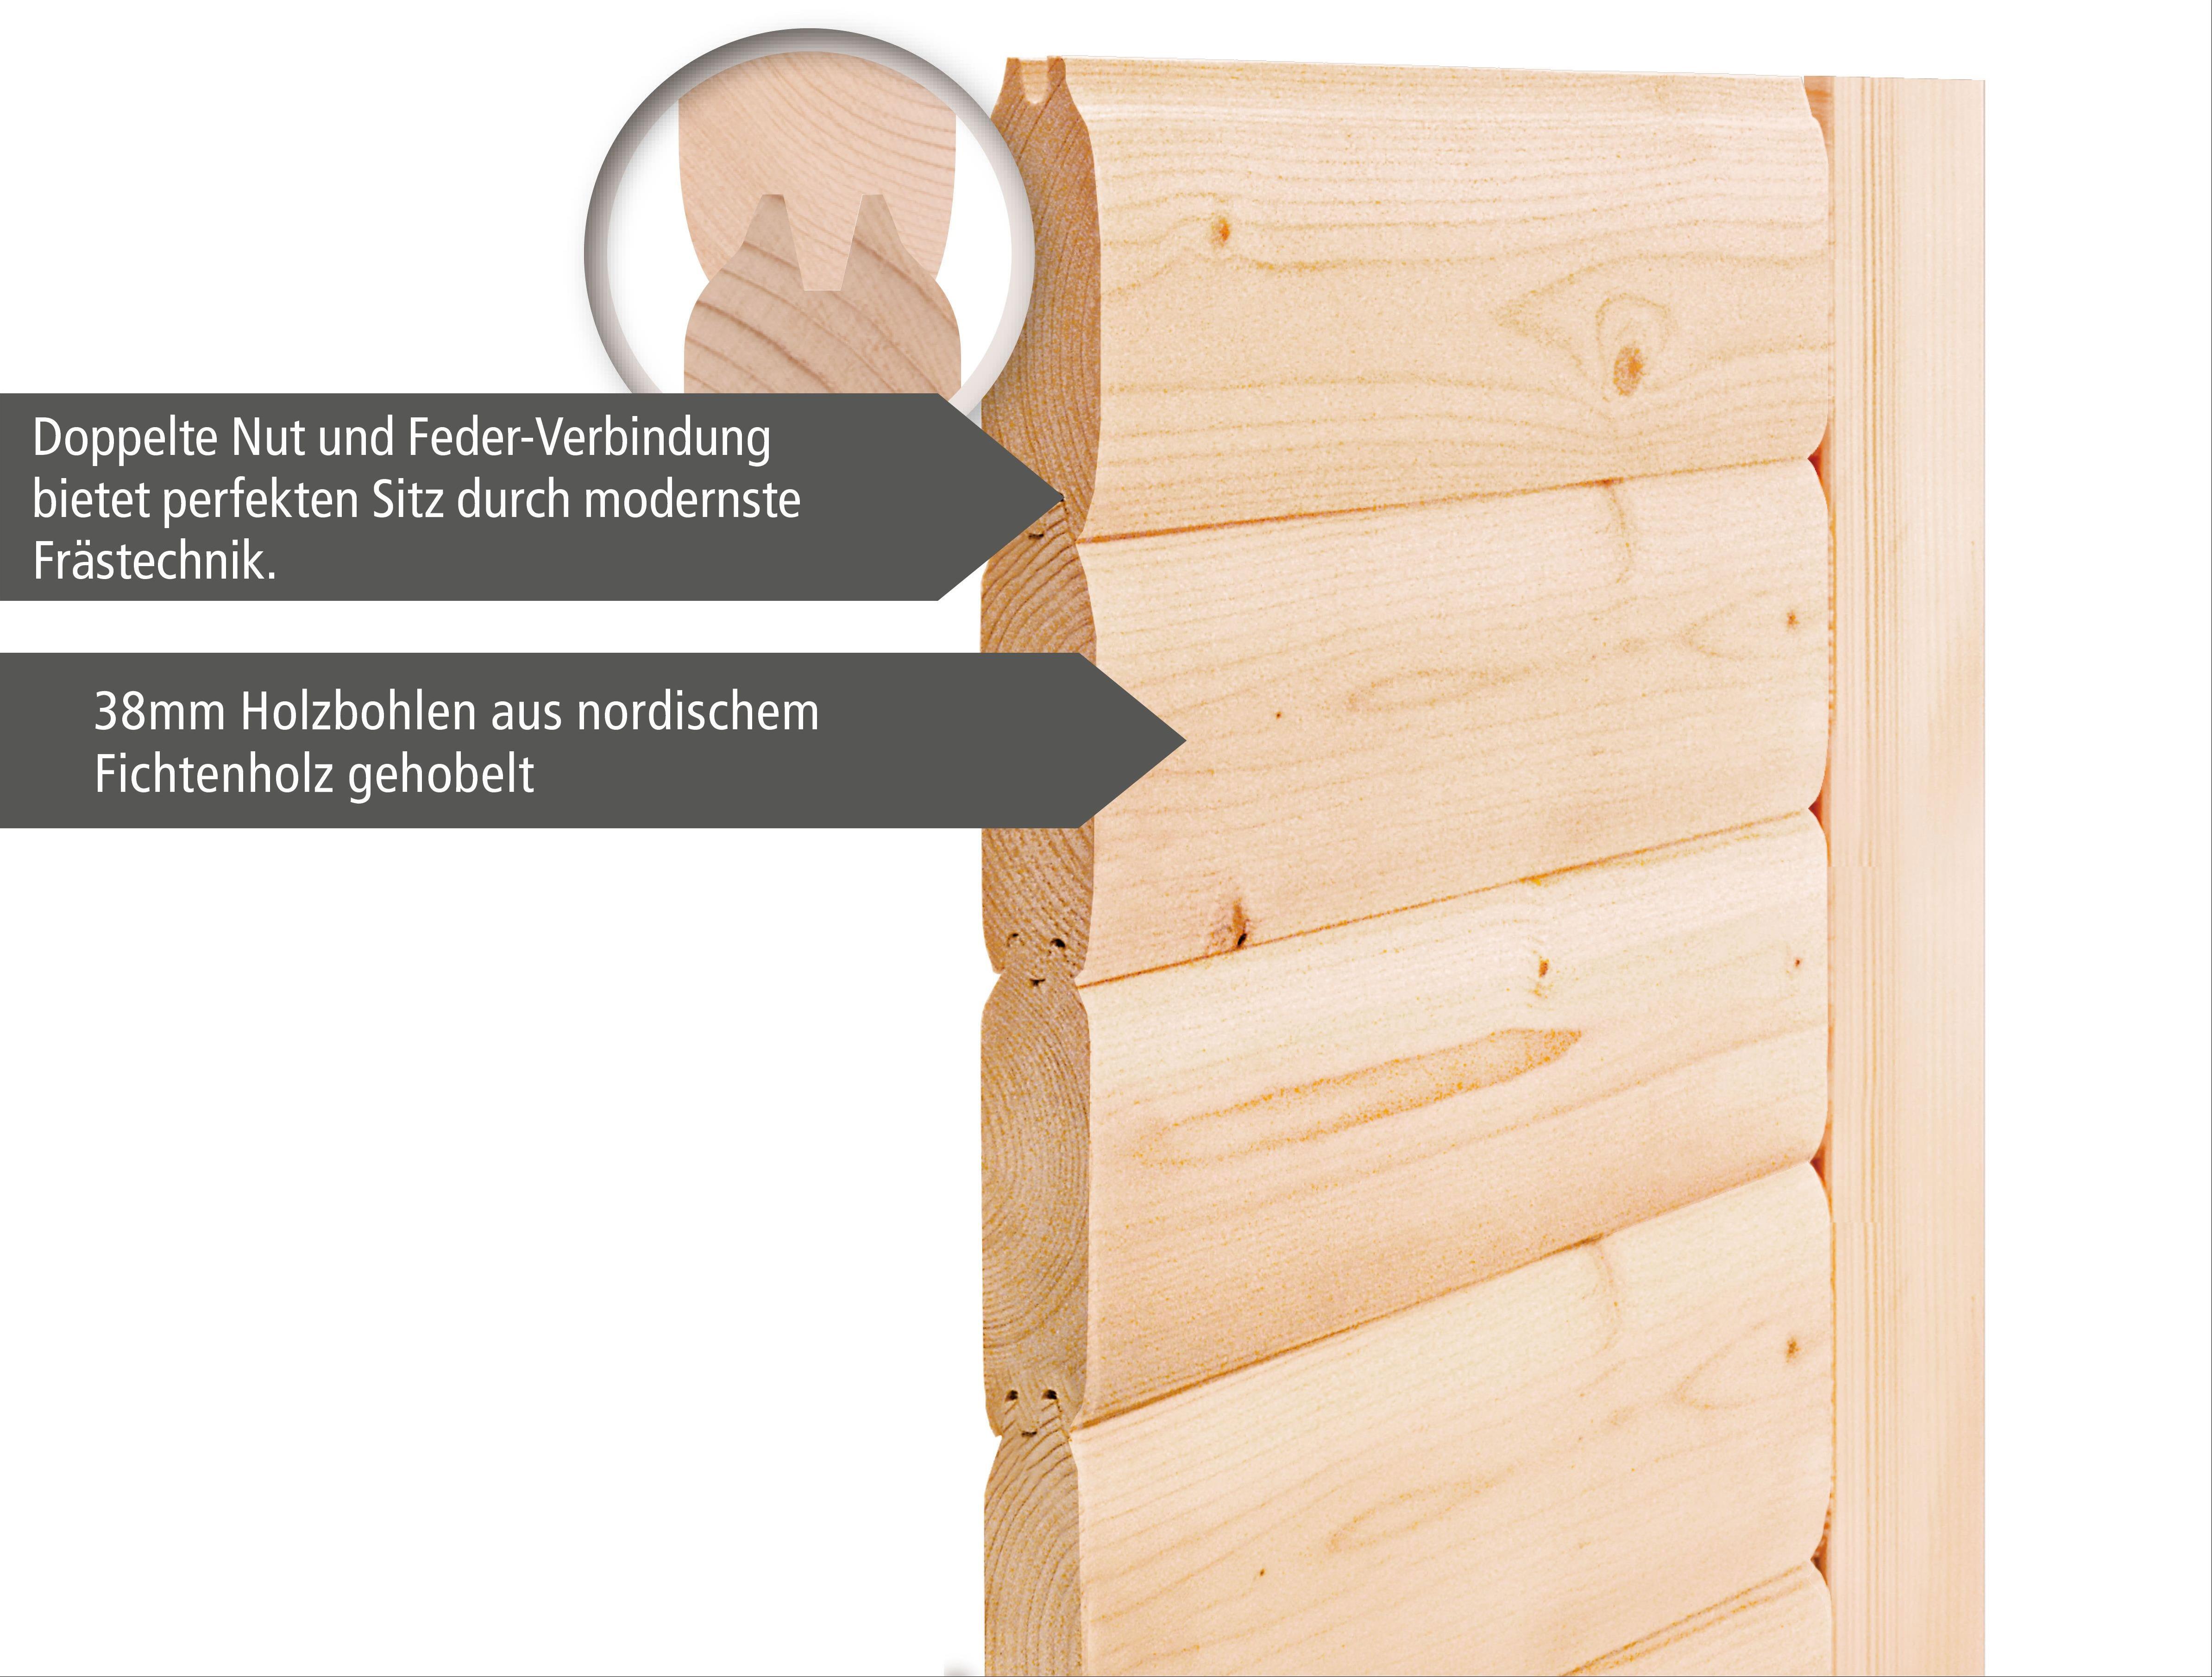 WoodFeeling Sauna Svea 38mm BioSaunaofen 9kW ext. Kranz moderne Tür Bild 5